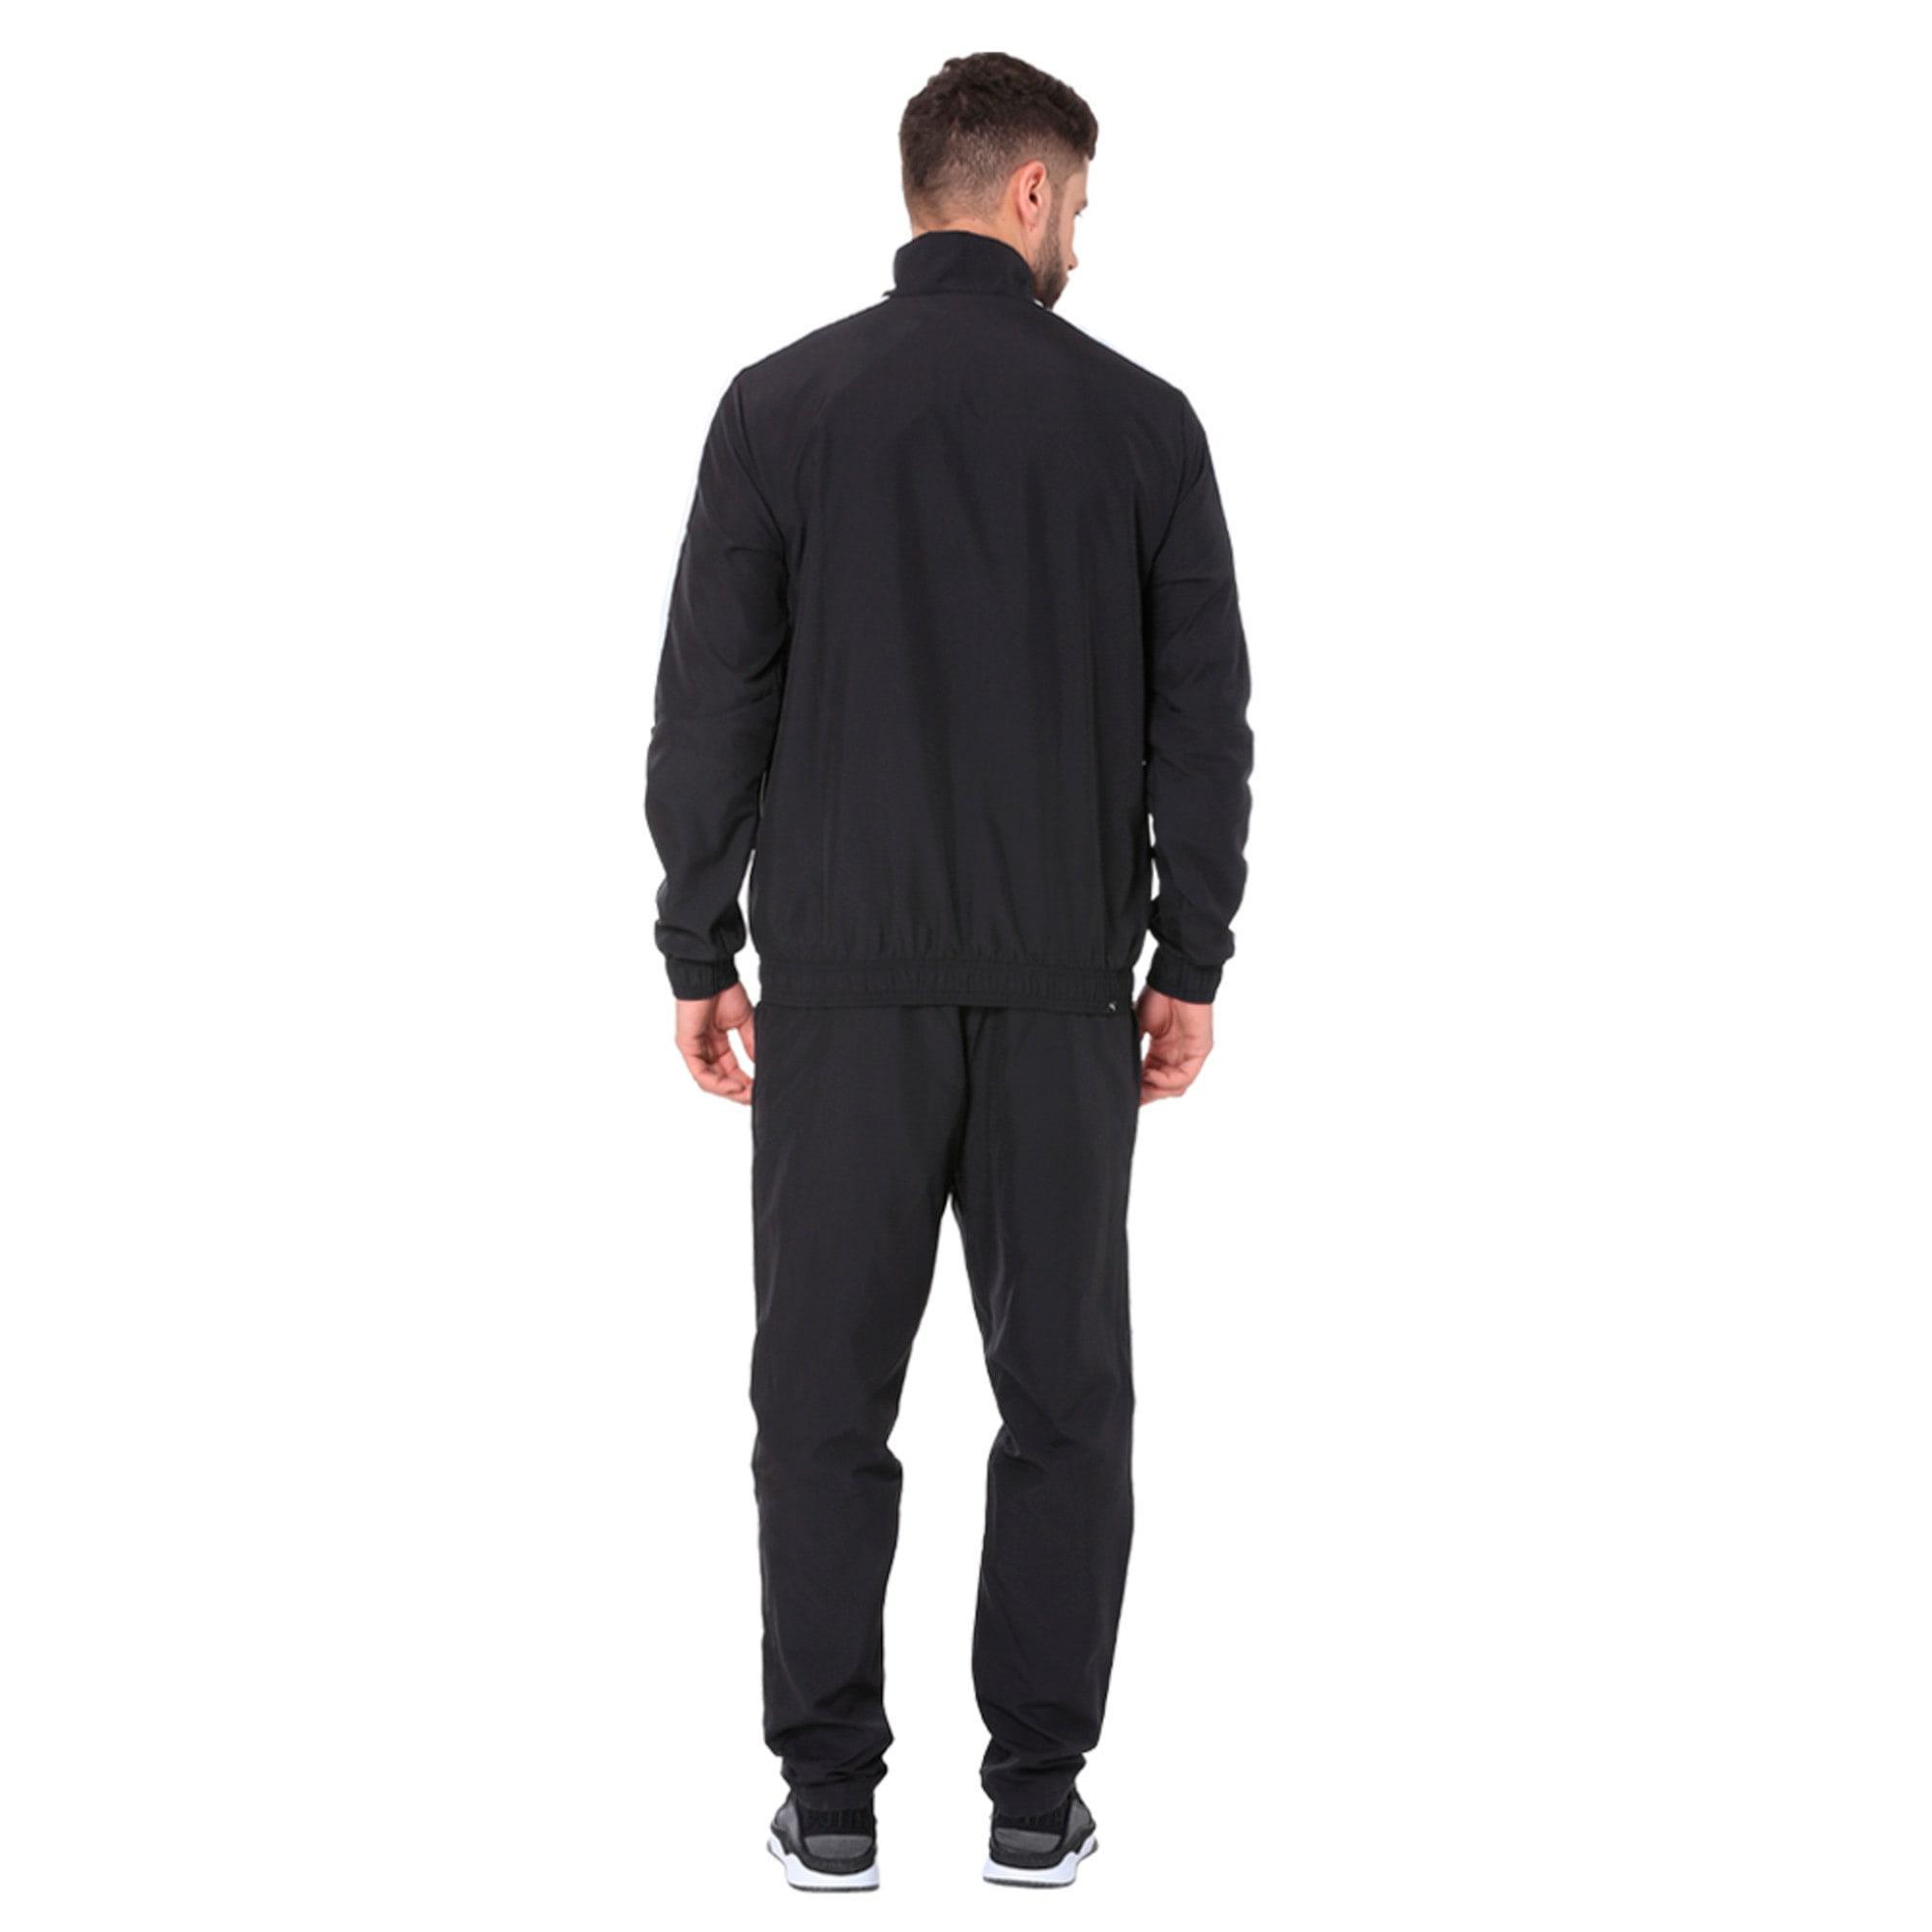 Thumbnail 3 of Classic Woven Men's Suit Op, Puma Black-Puma White, medium-IND